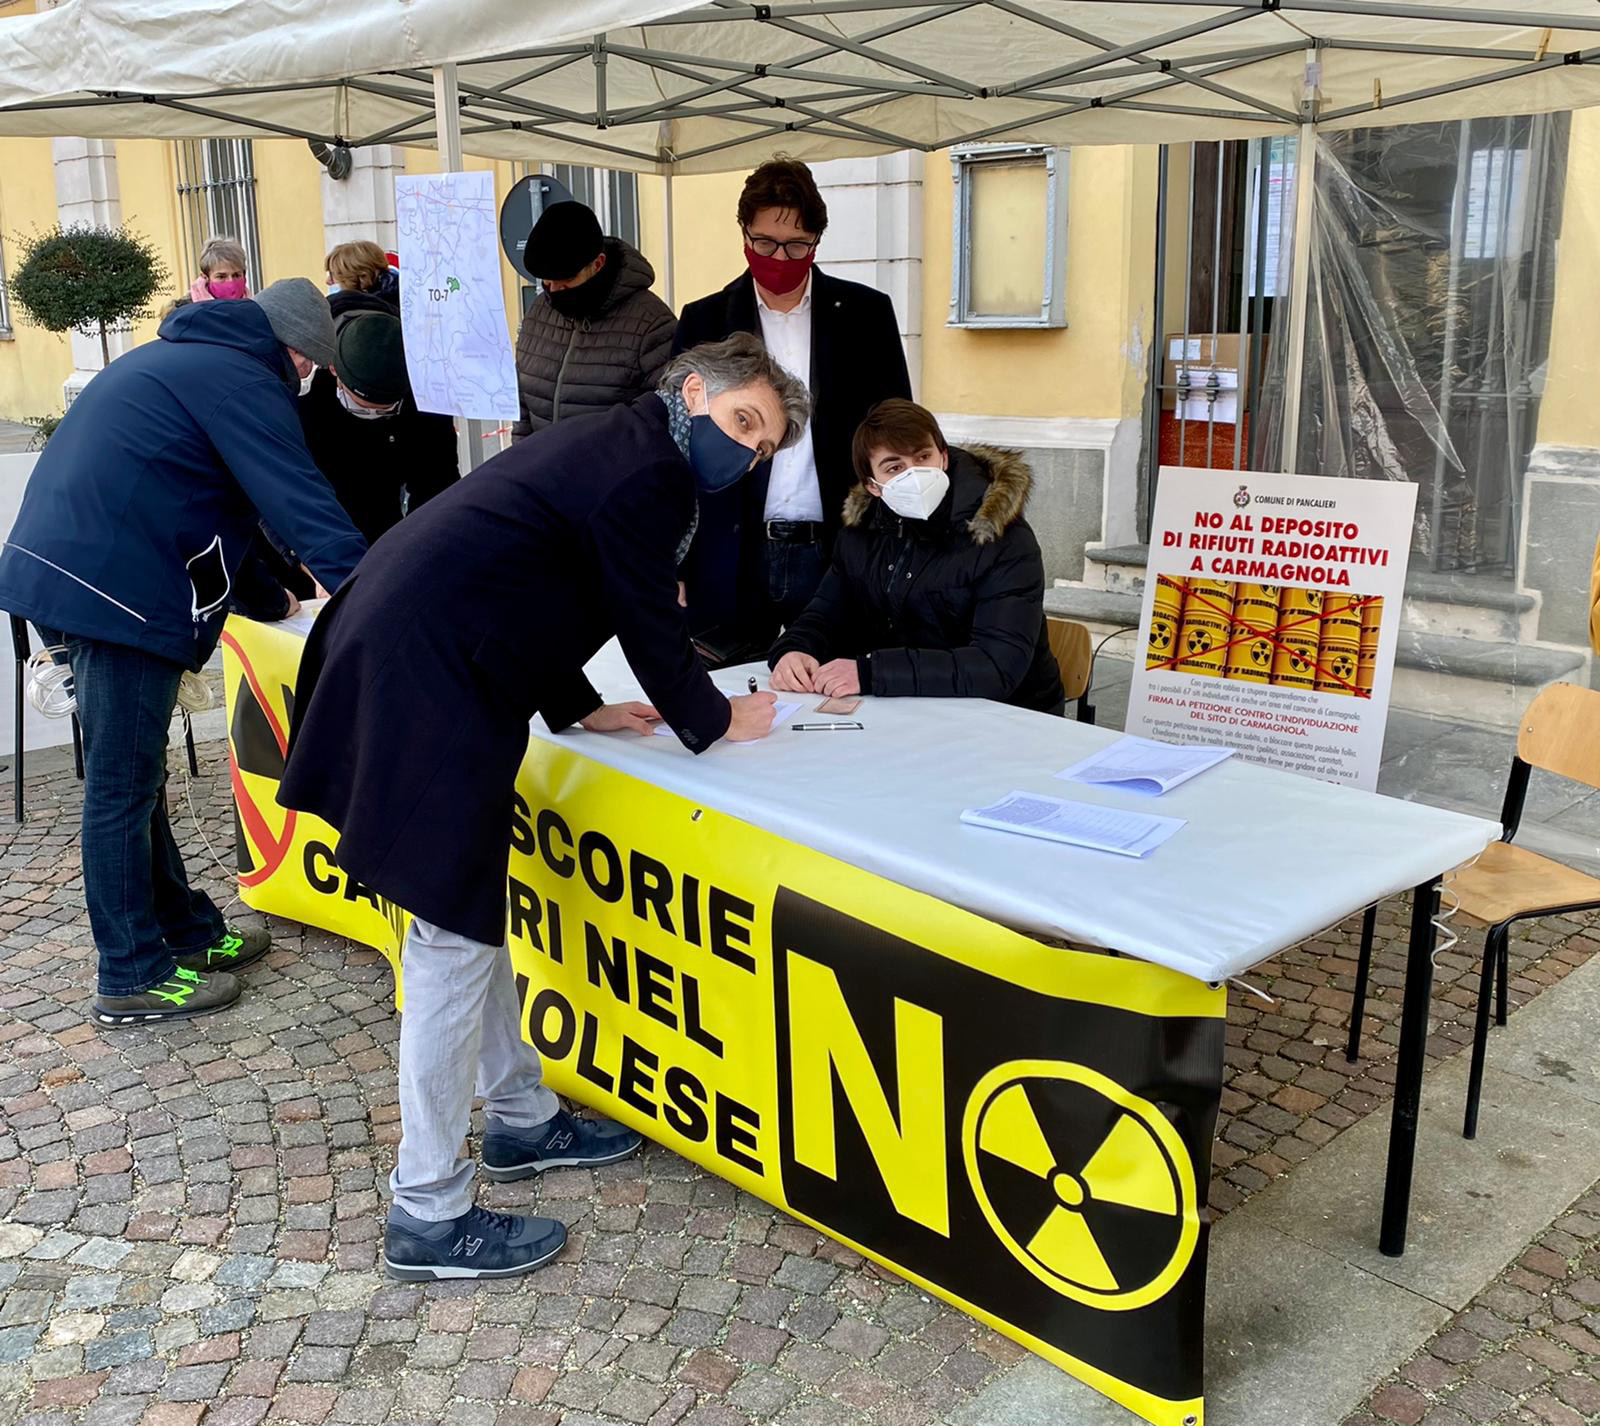 Firme dei pancalieresi contro il deposito di rifiuti radioattivi a Carmagnola